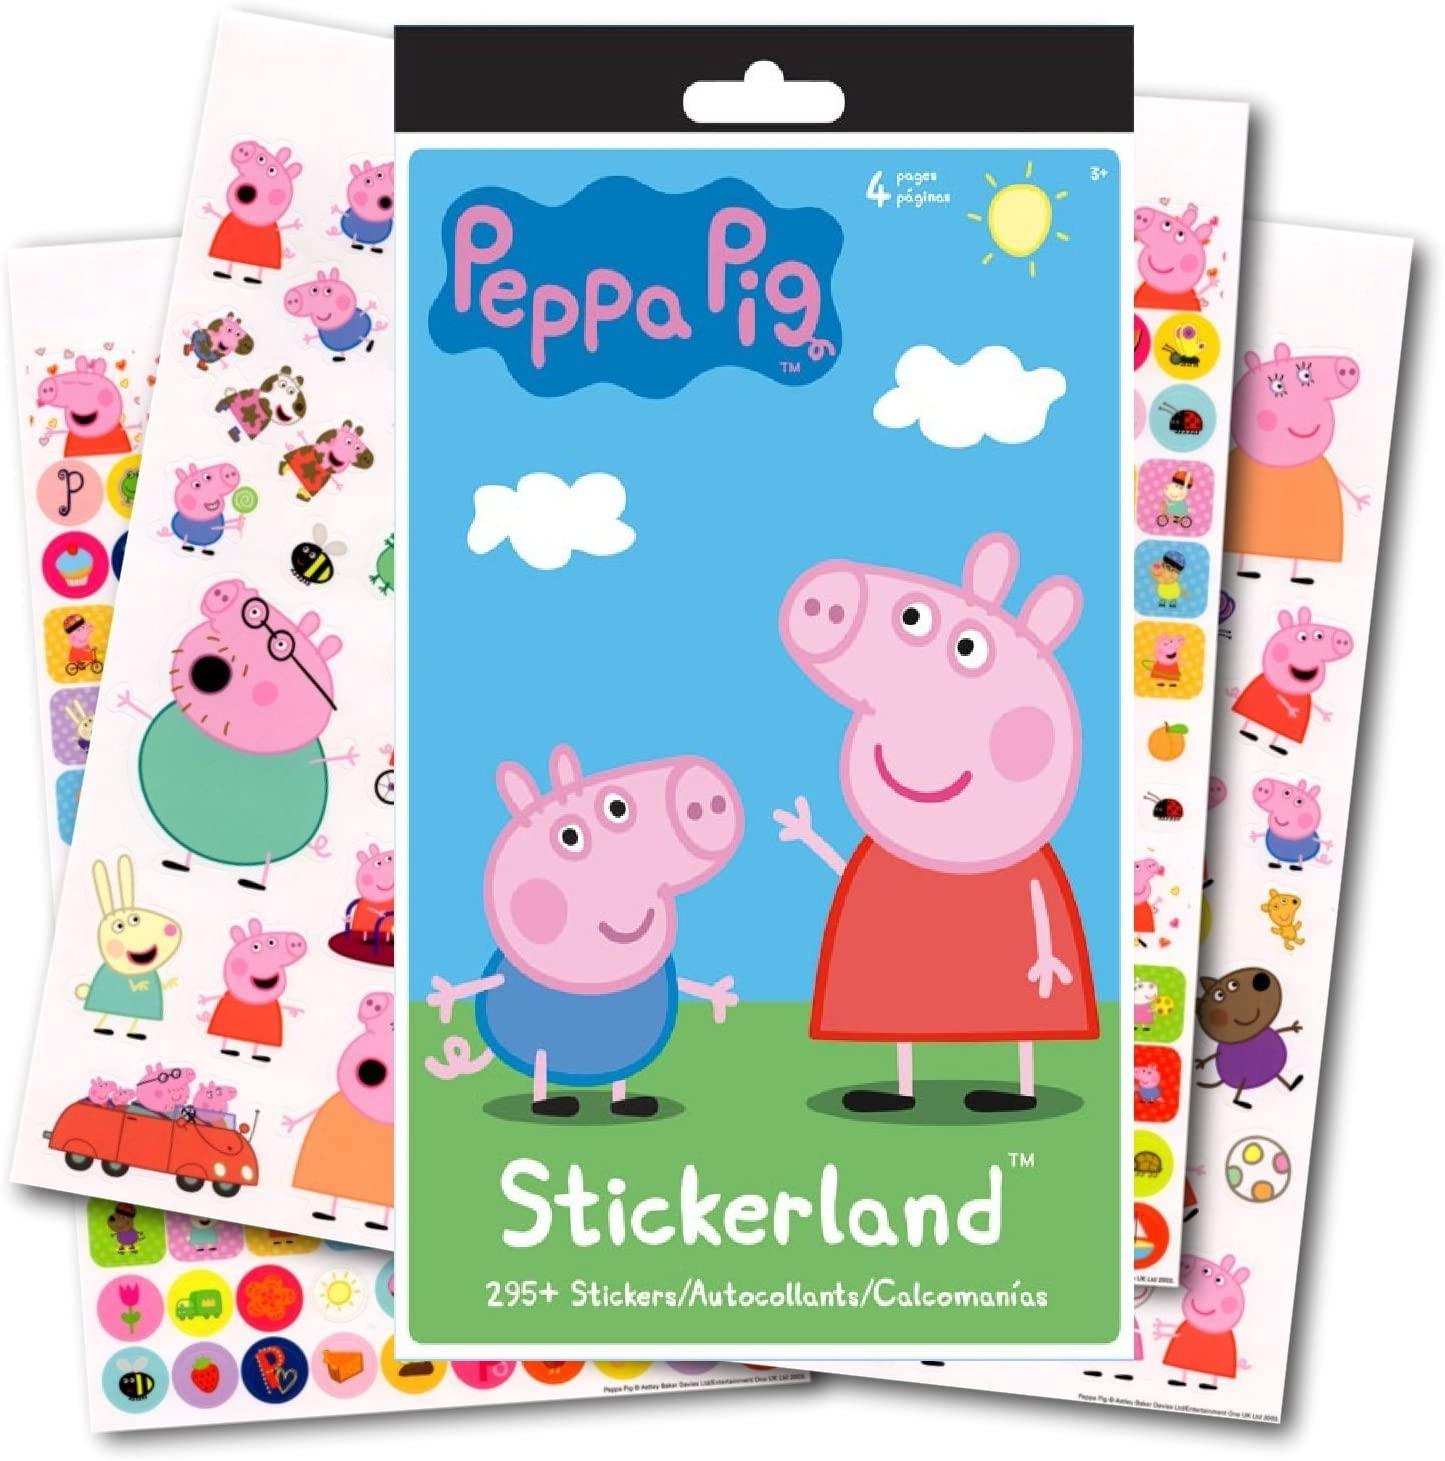 peppa pig-accessories-3